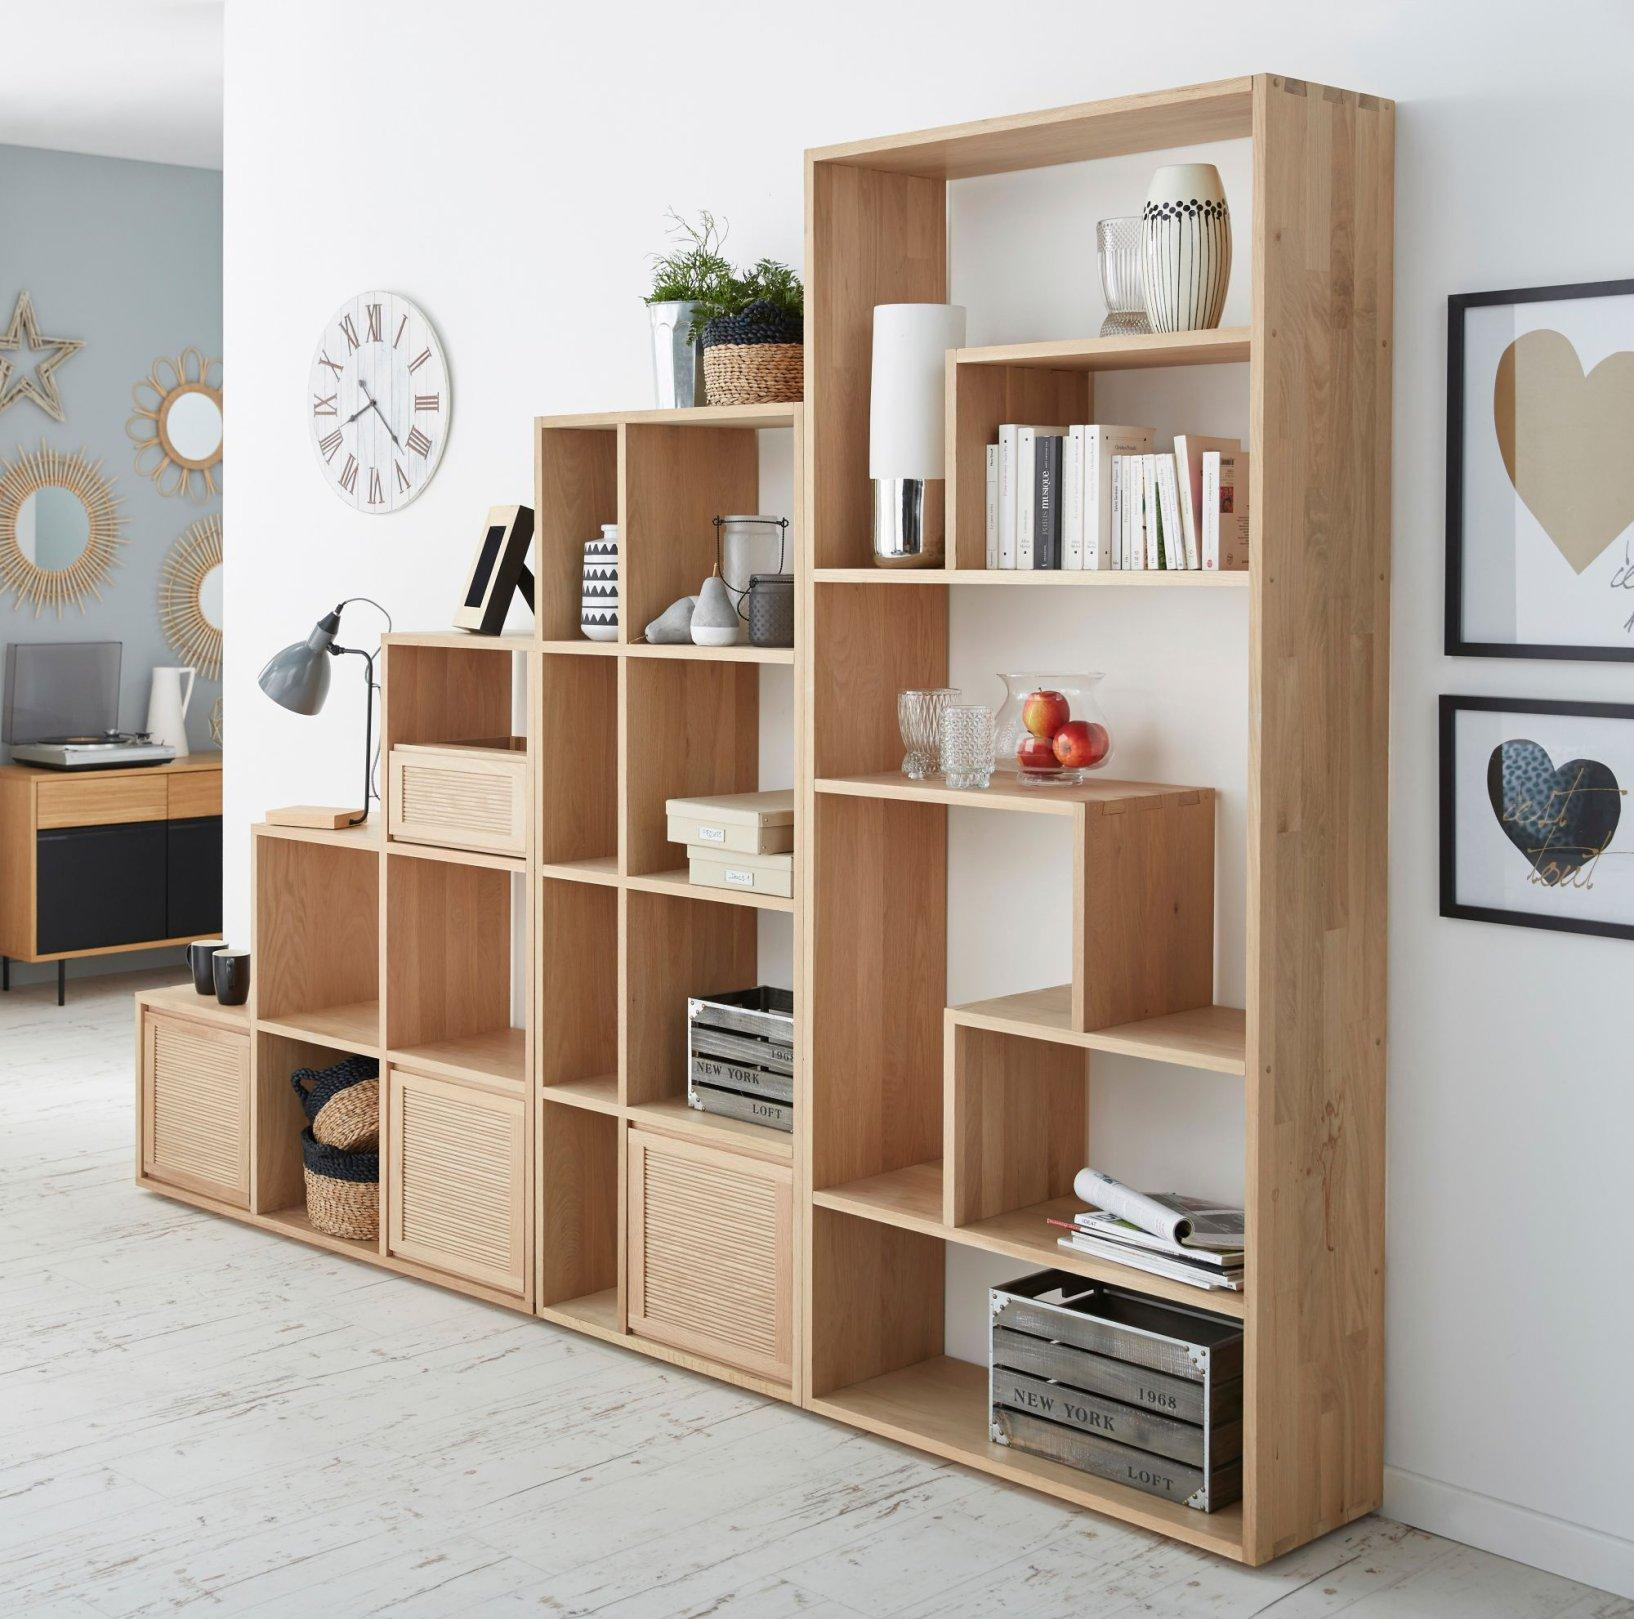 Мебель в стиле модерн дуб сонома